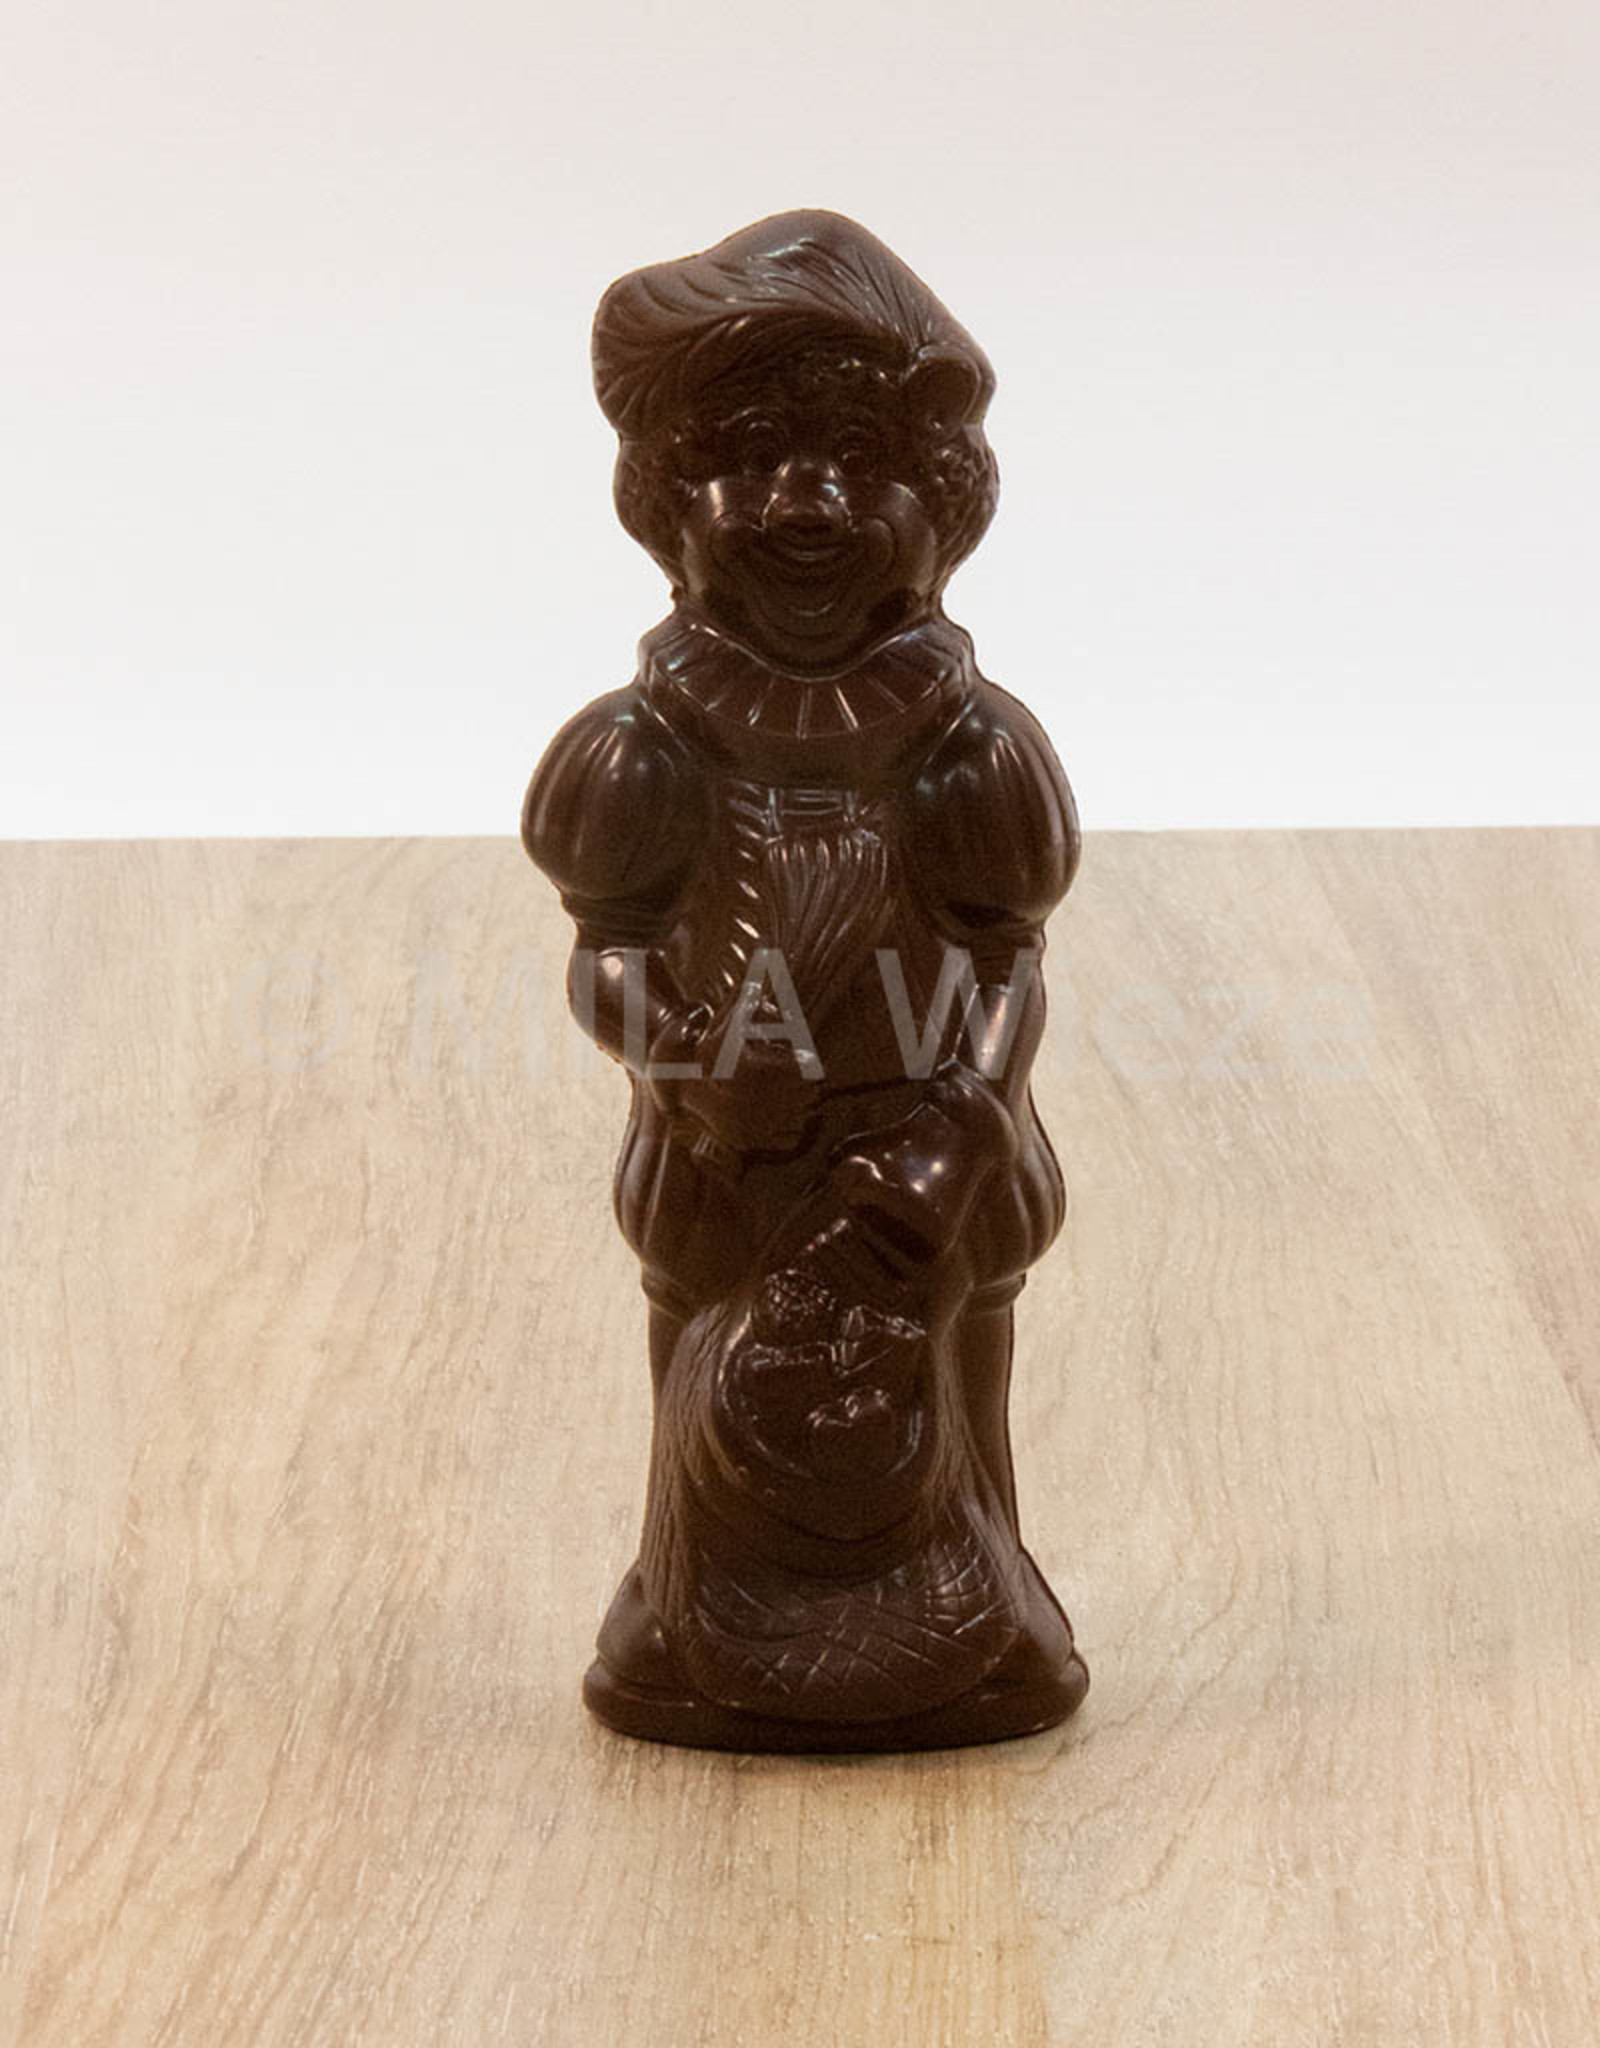 Lachende piet - 90 gr - 18 cm - melkchocolade of fondant chocolade